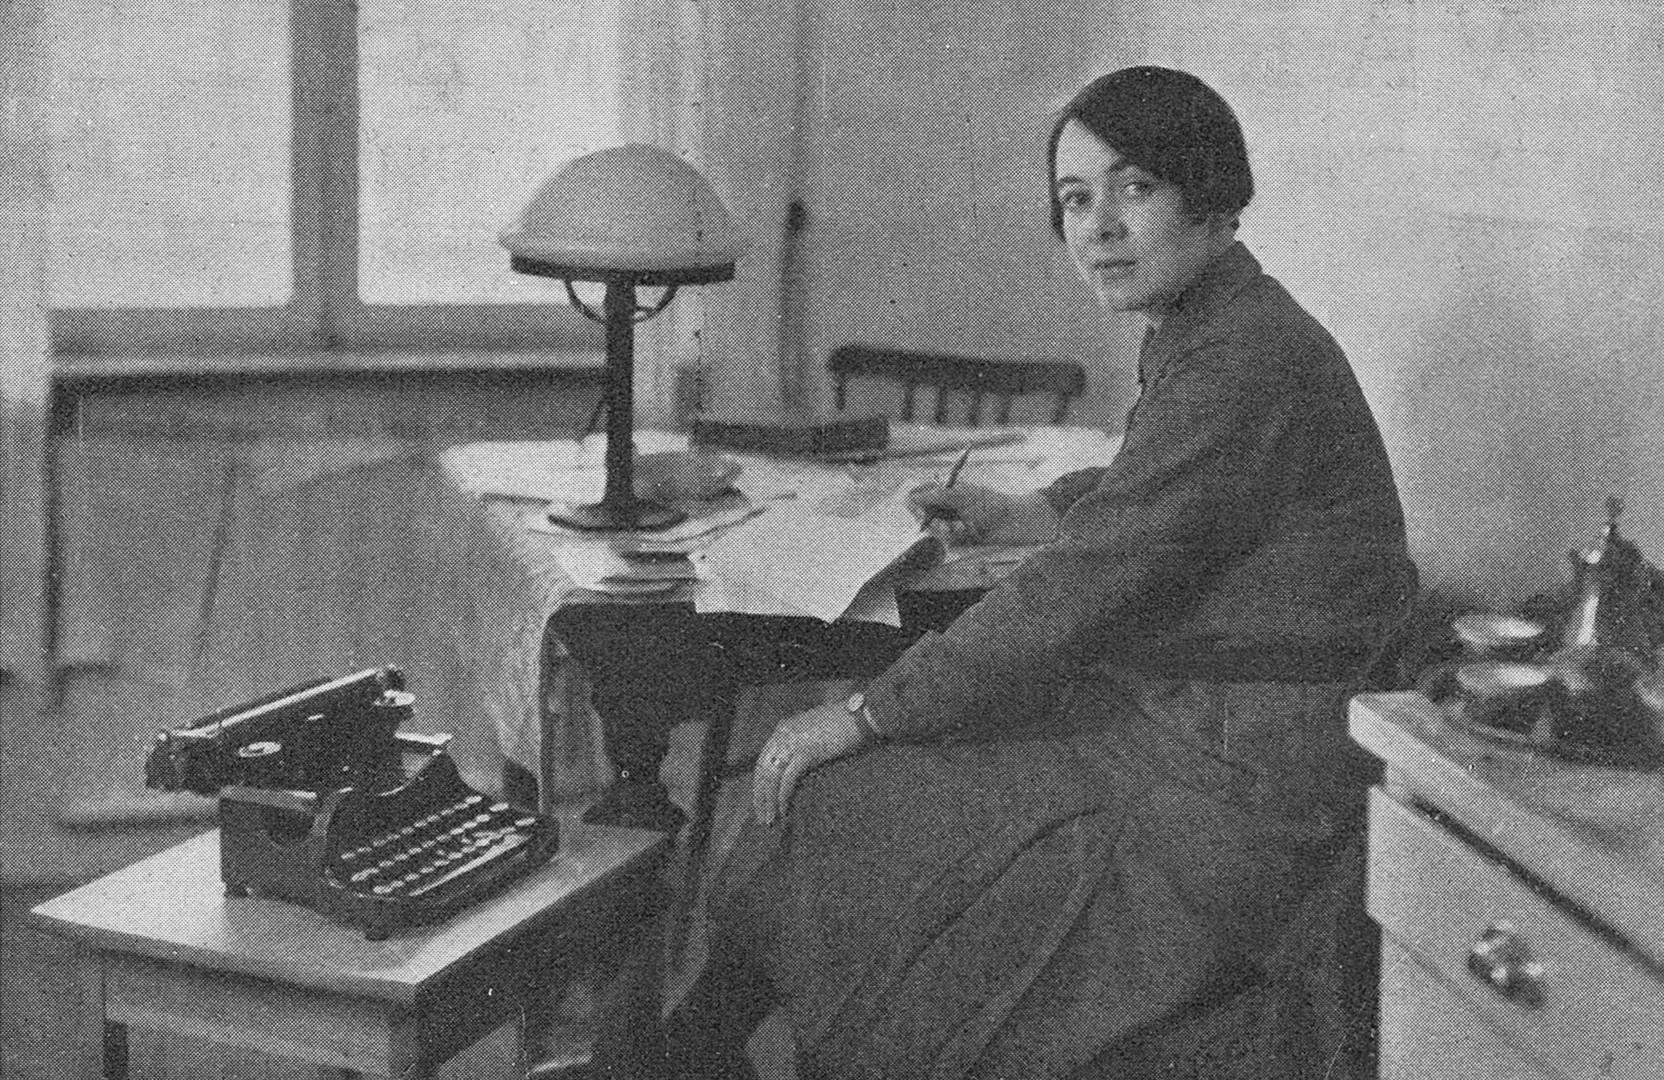 Karin Boye at her kitchen table. Idun, 1931, photographer unknown. Image source: Svenskt Porträttarkiv (CC-BY-NC-SA 4.0)